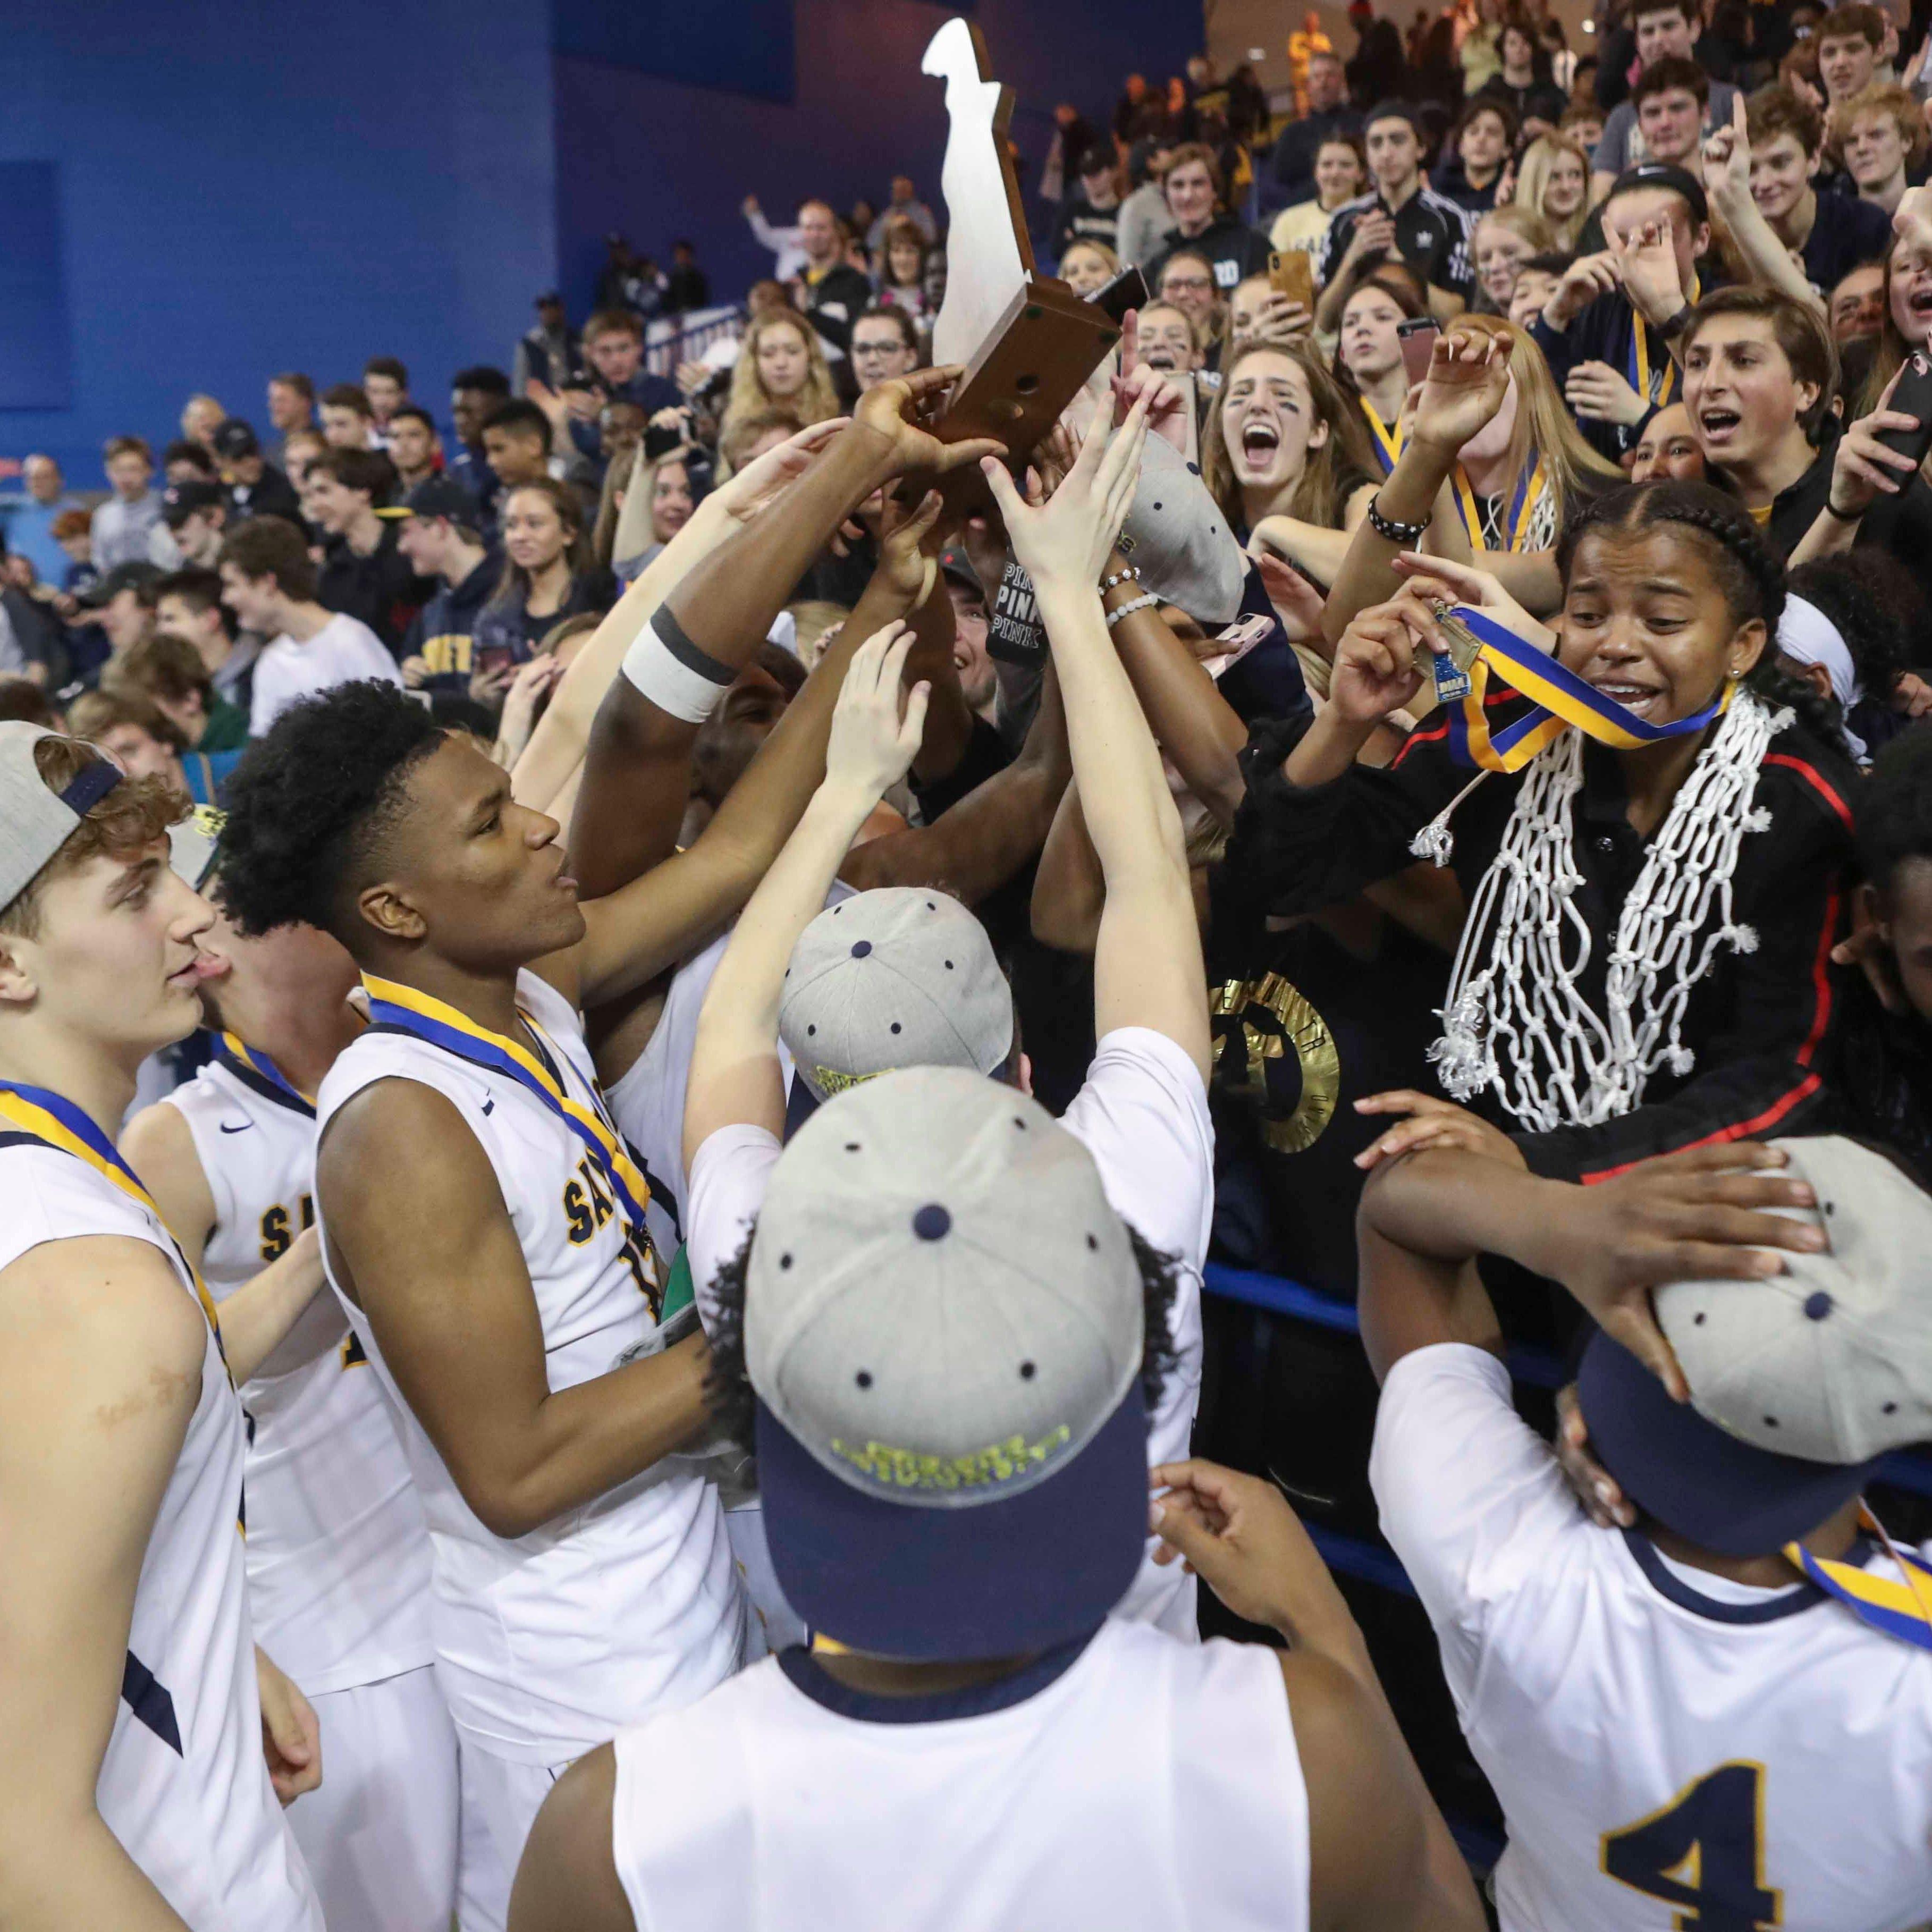 Sanford boys rally past Dover for thrilling DIAA boys basketball championship